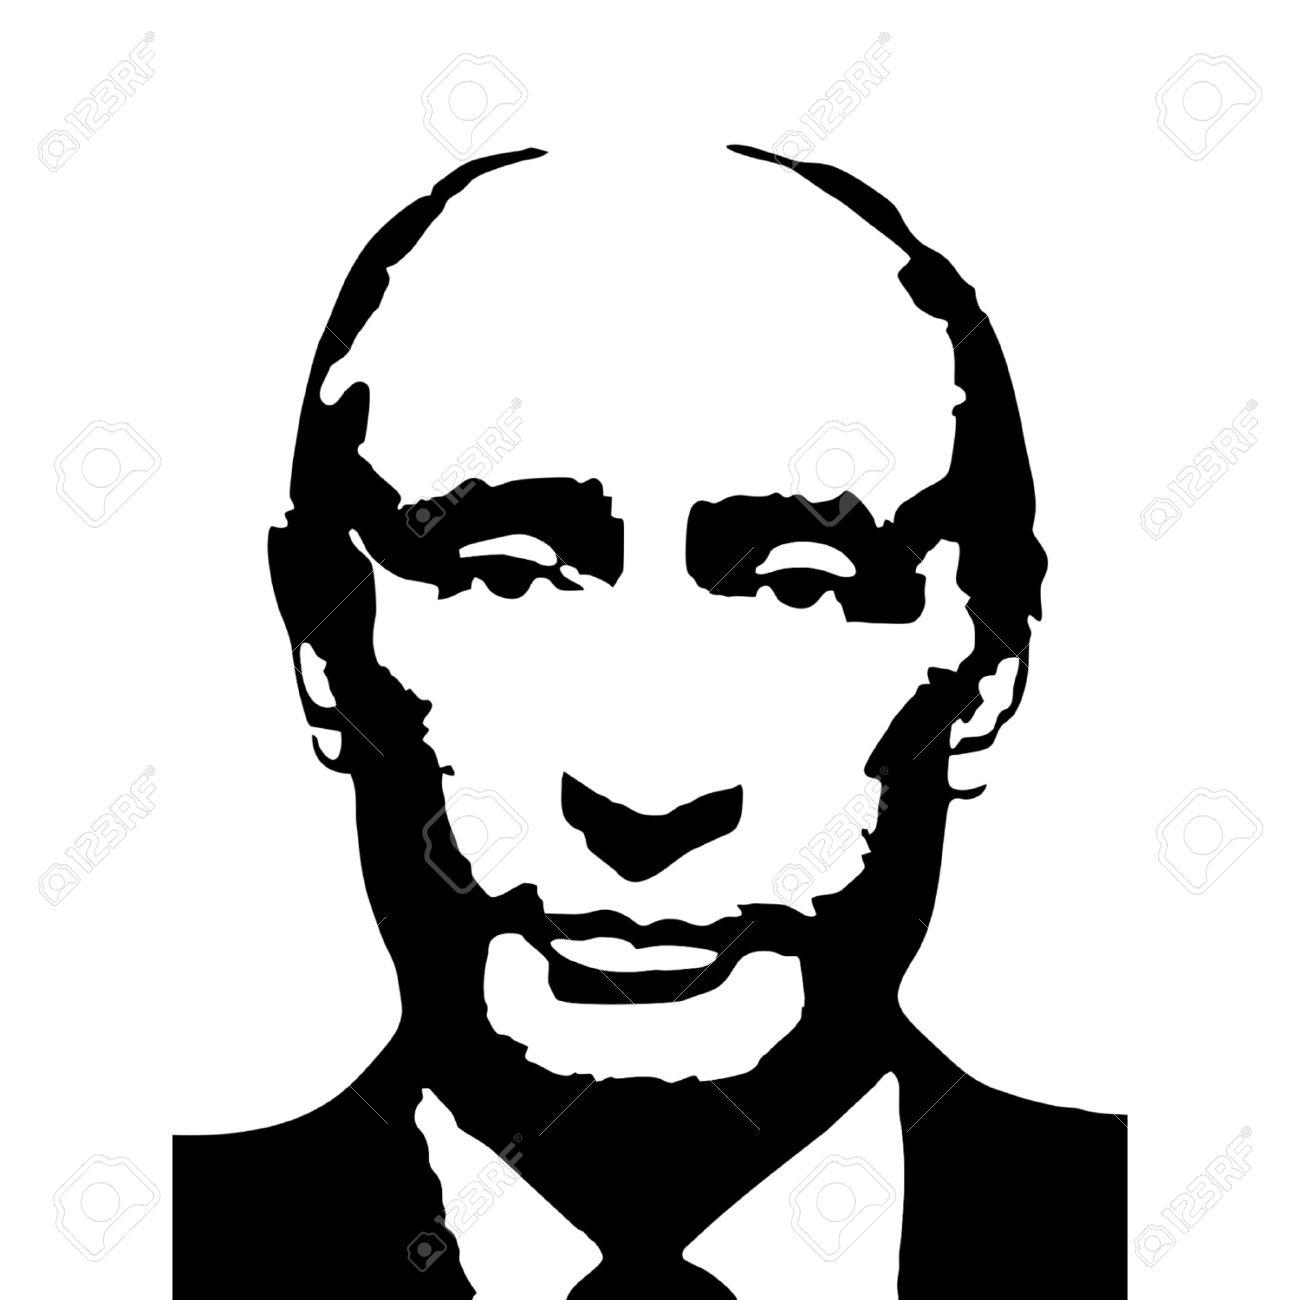 Putin clipart.